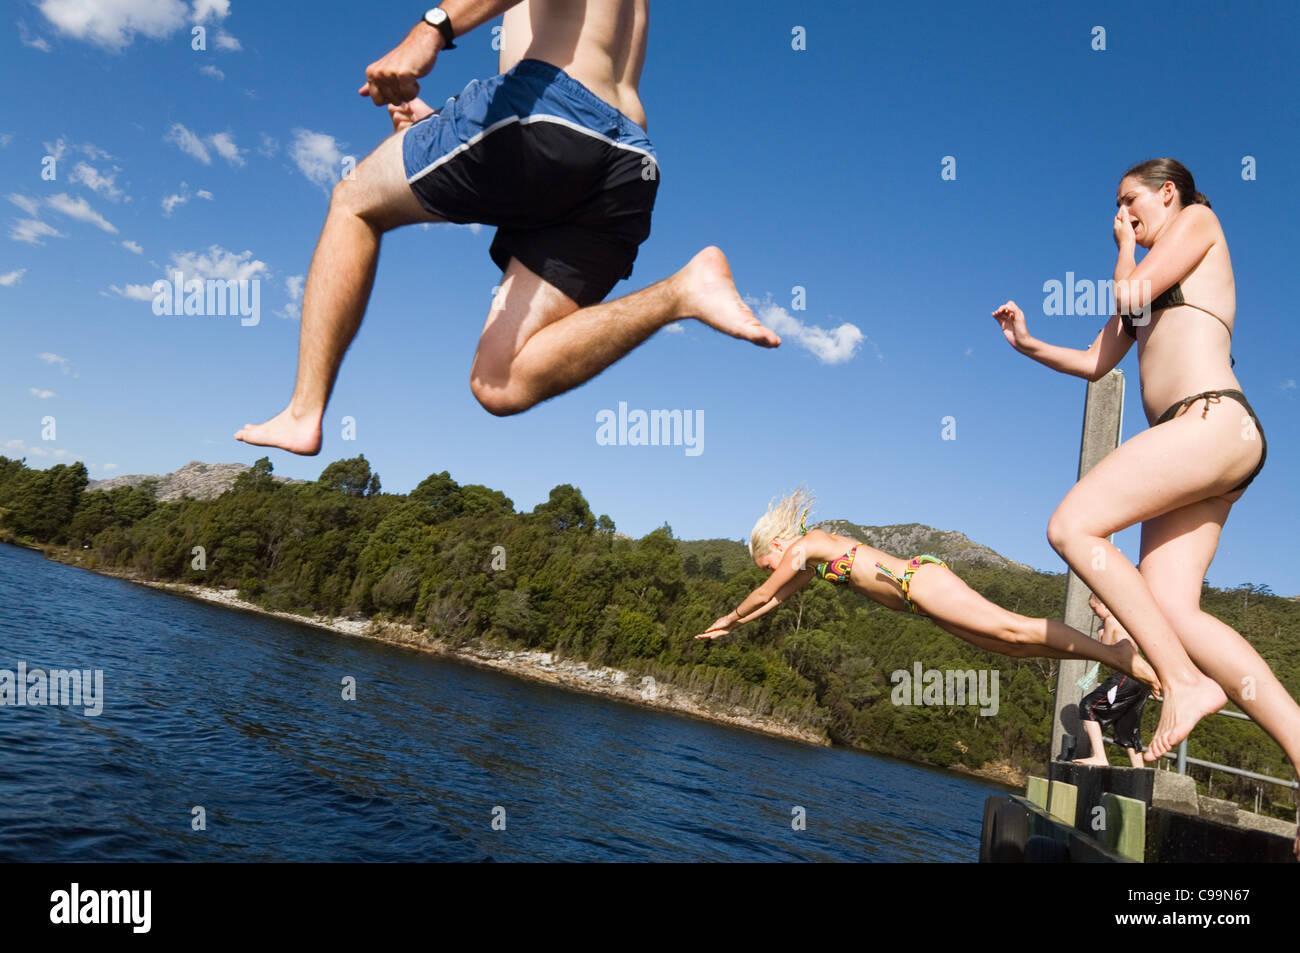 Un grupo saltando de un muelle en un lago. Lago Rosebery, Tullah, Tasmania, Australia Foto de stock